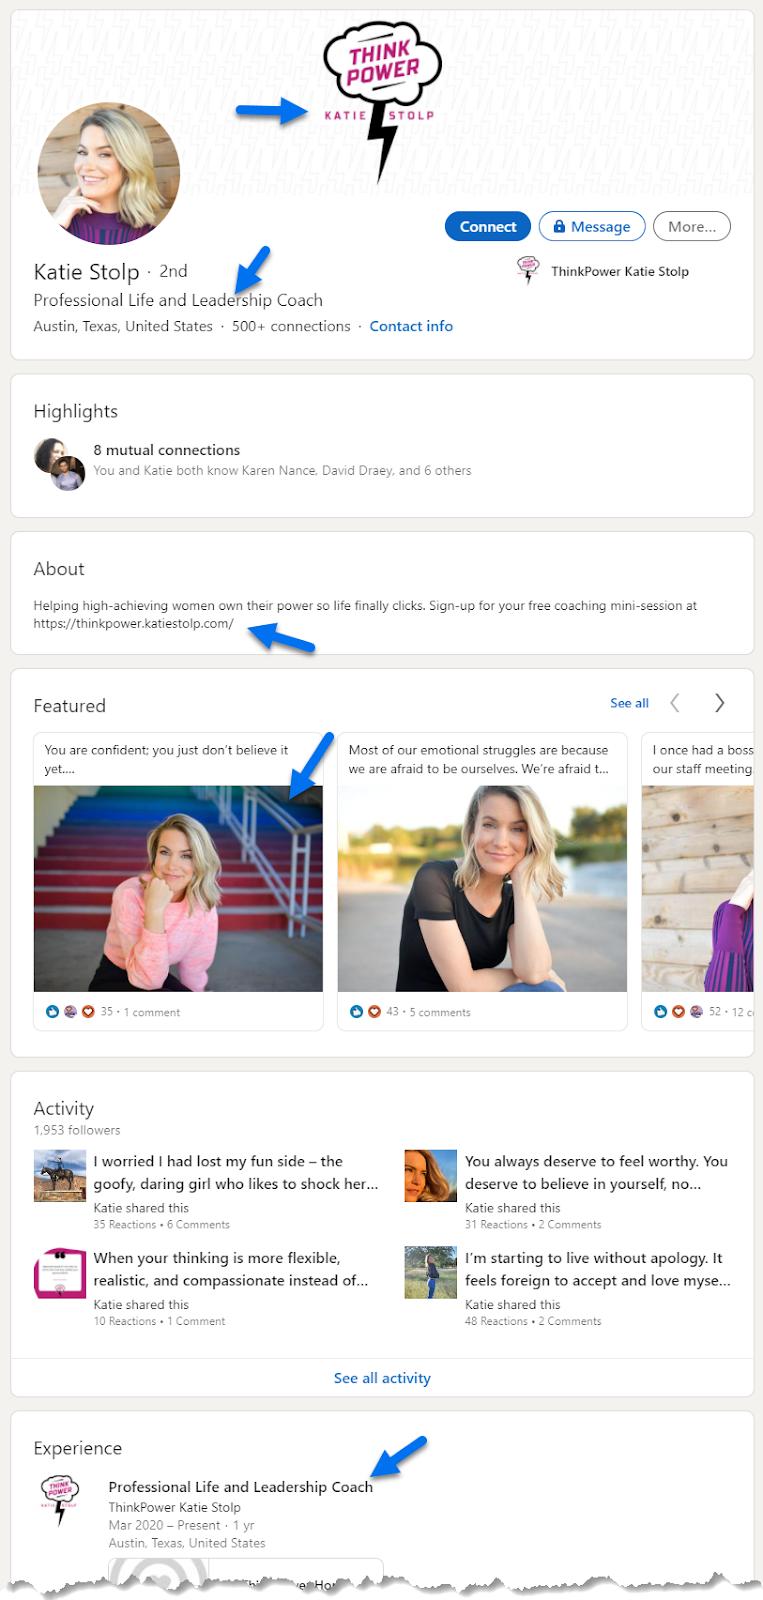 Life coach Katie Stolp's LinkedIn profile